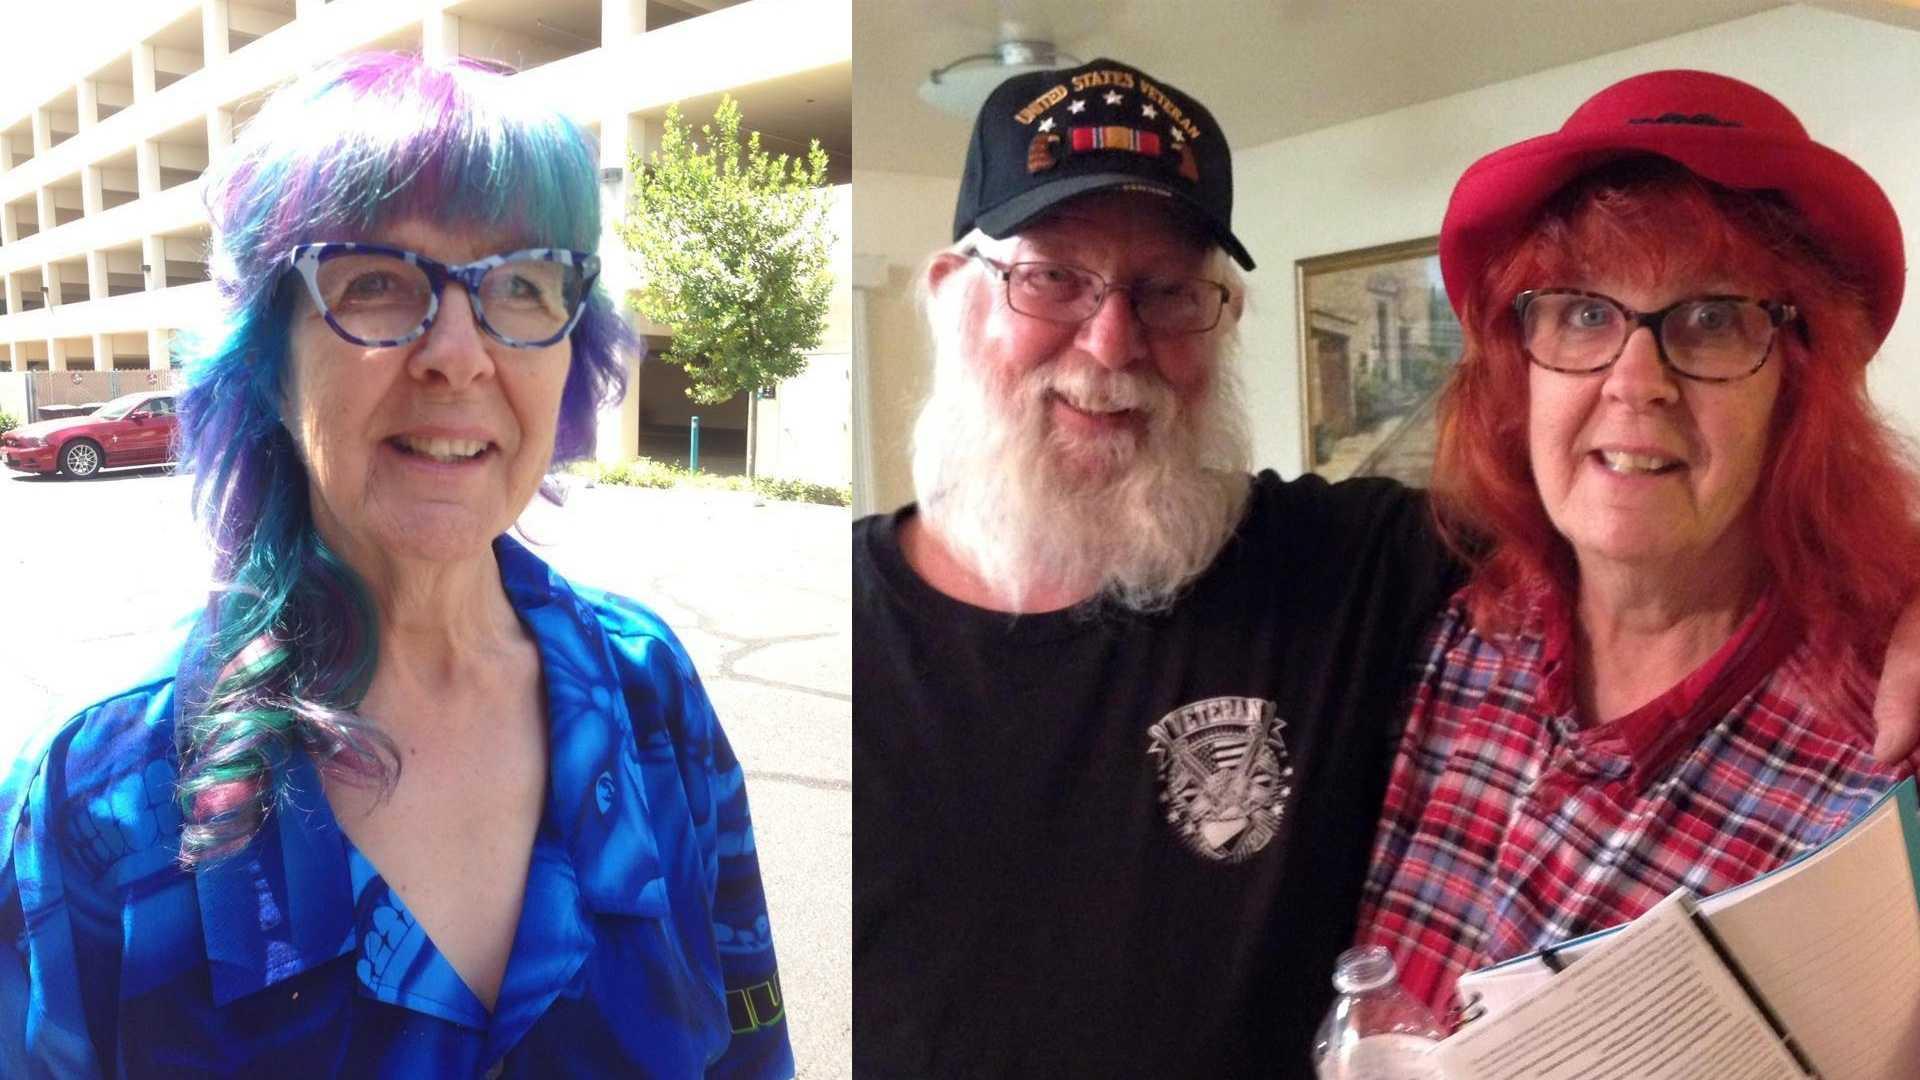 Photos show Donna Zurfluh and her husband Ron Zurfluh.